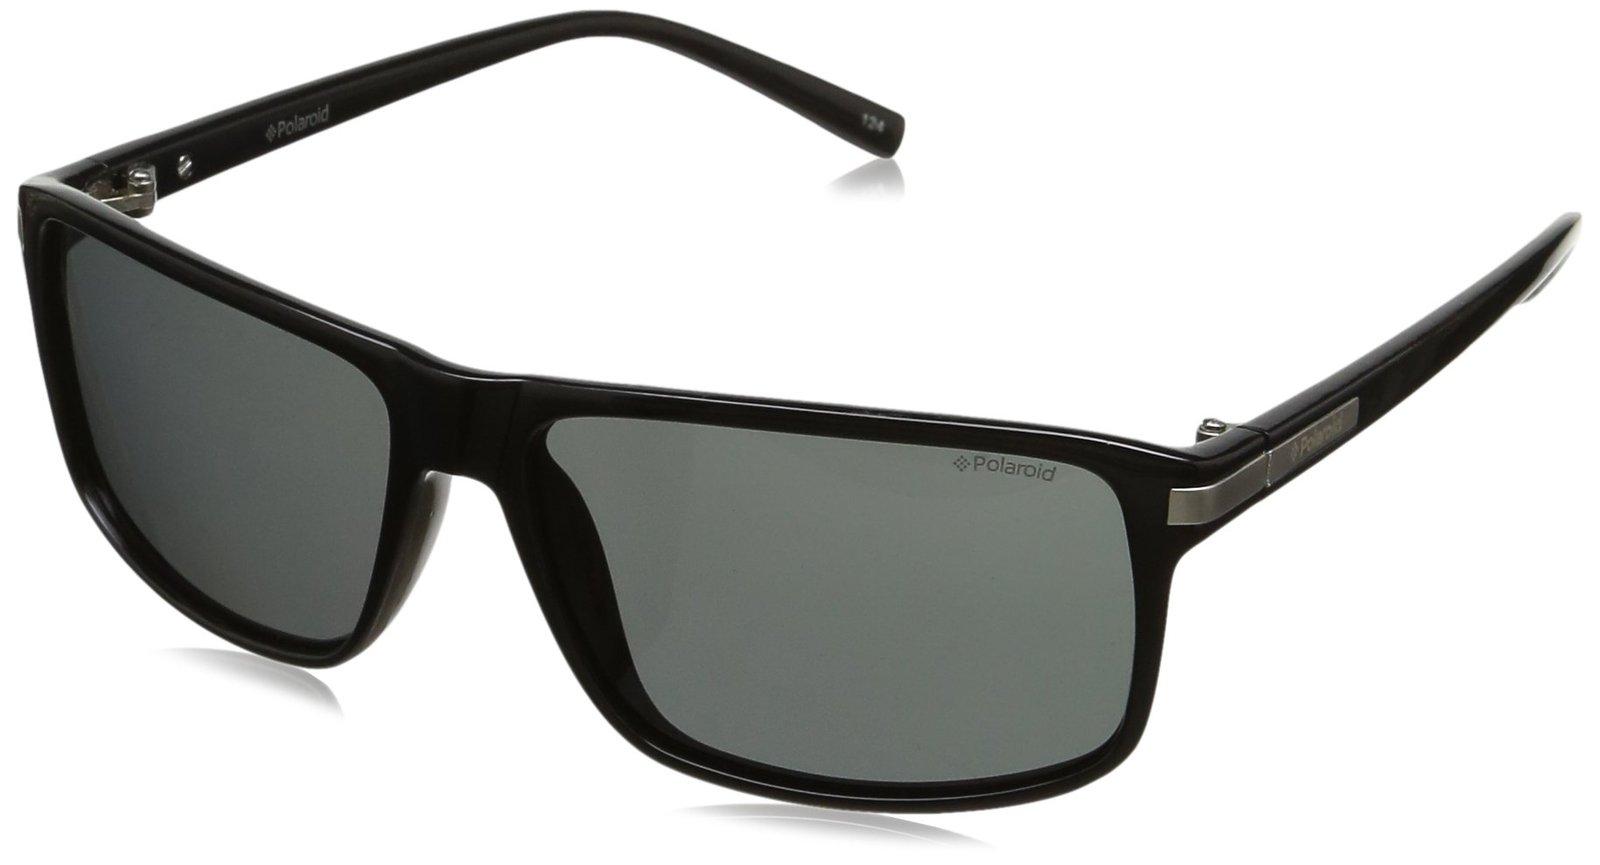 Sunglasses CheapGreen Sale Canada For Polaroid Communities 1JcFKl